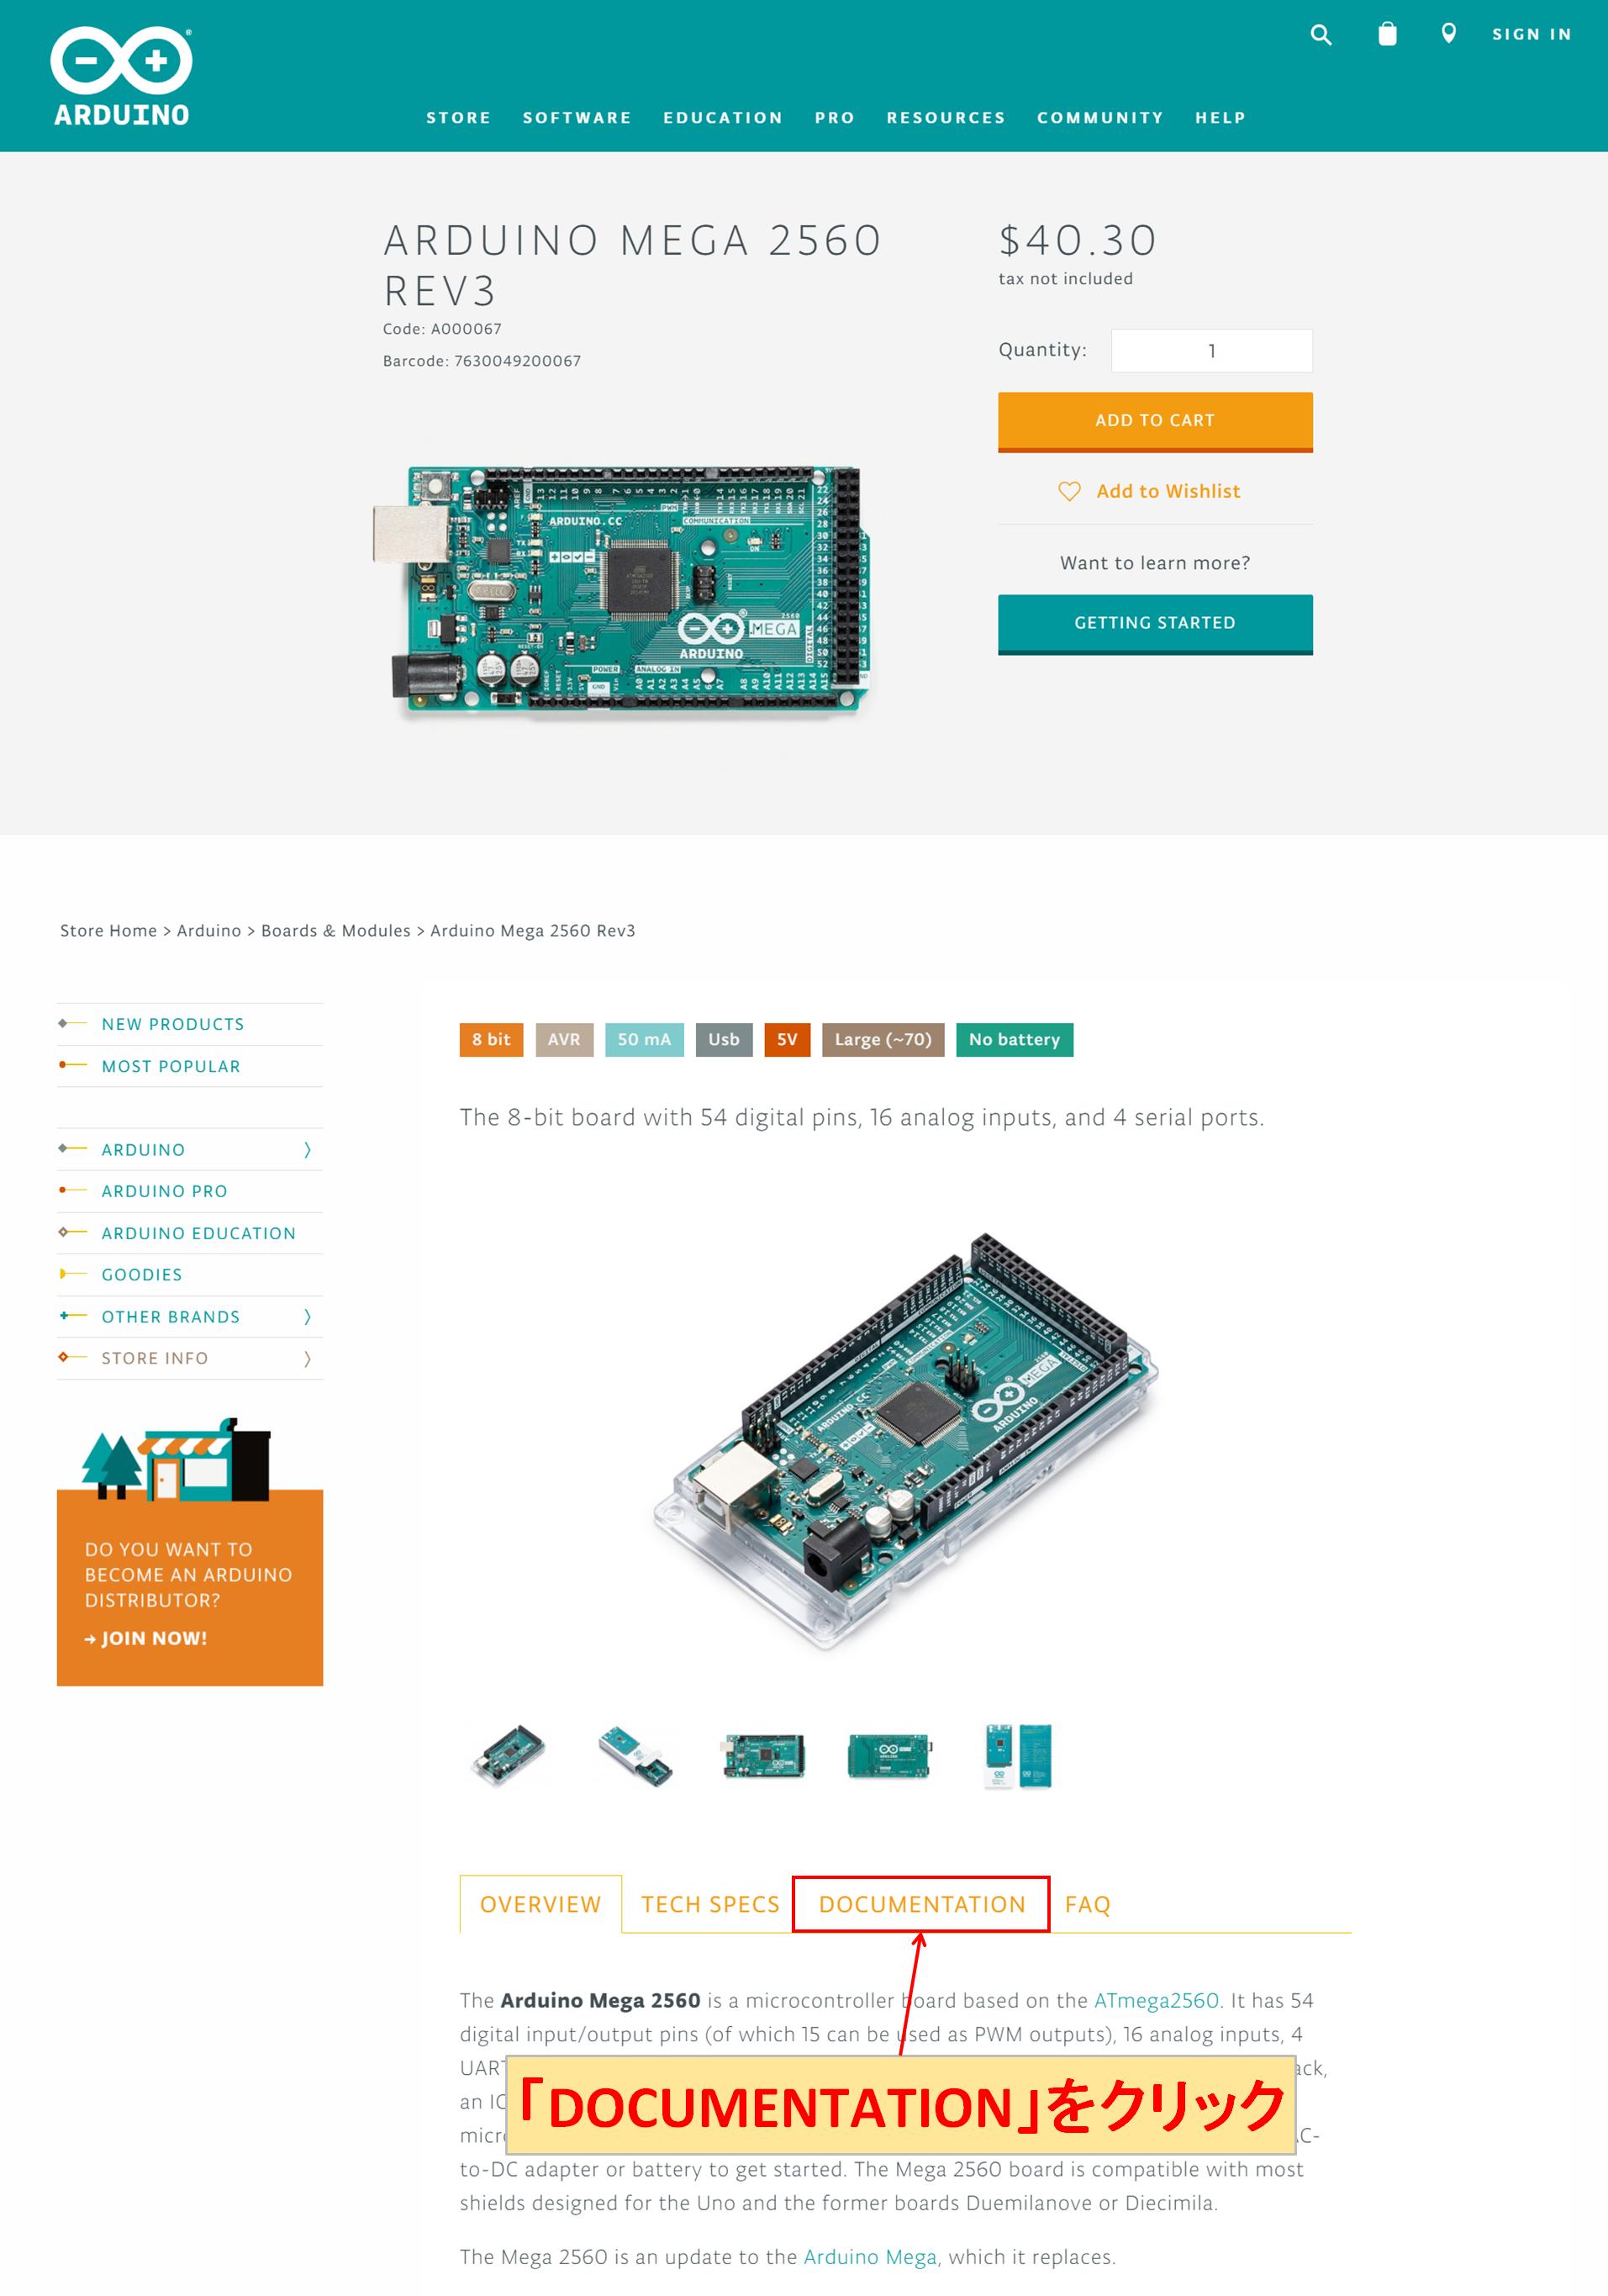 Arduino Mega 2560 DOCUMENTATION